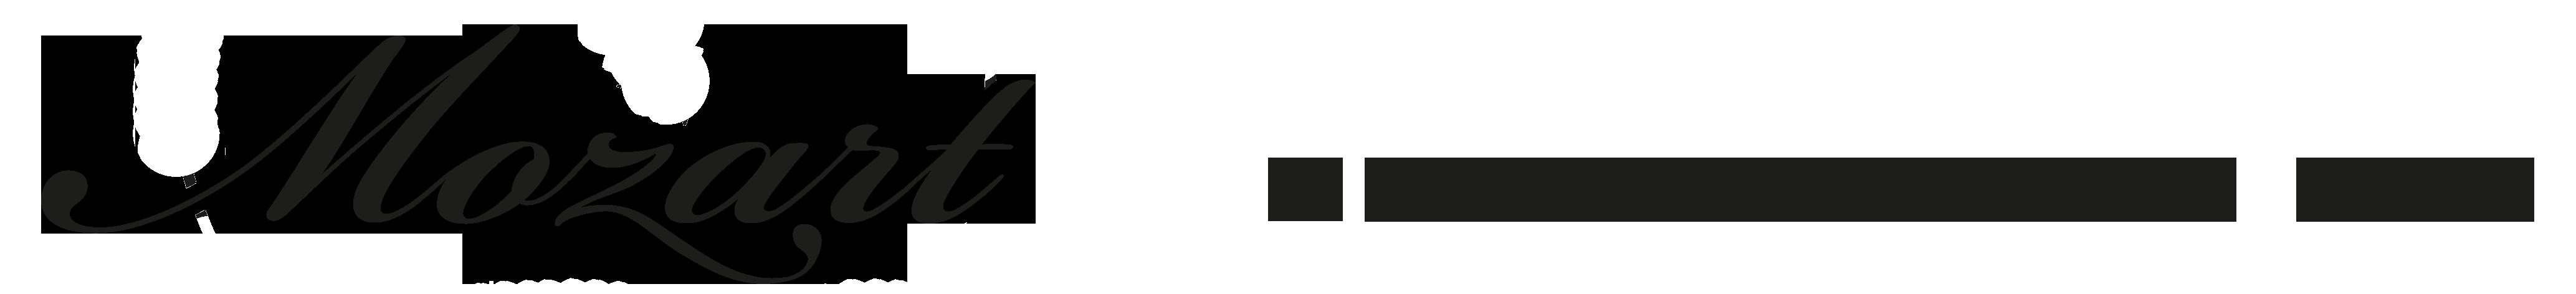 Mozart Restaurant - More Than Just Ribs